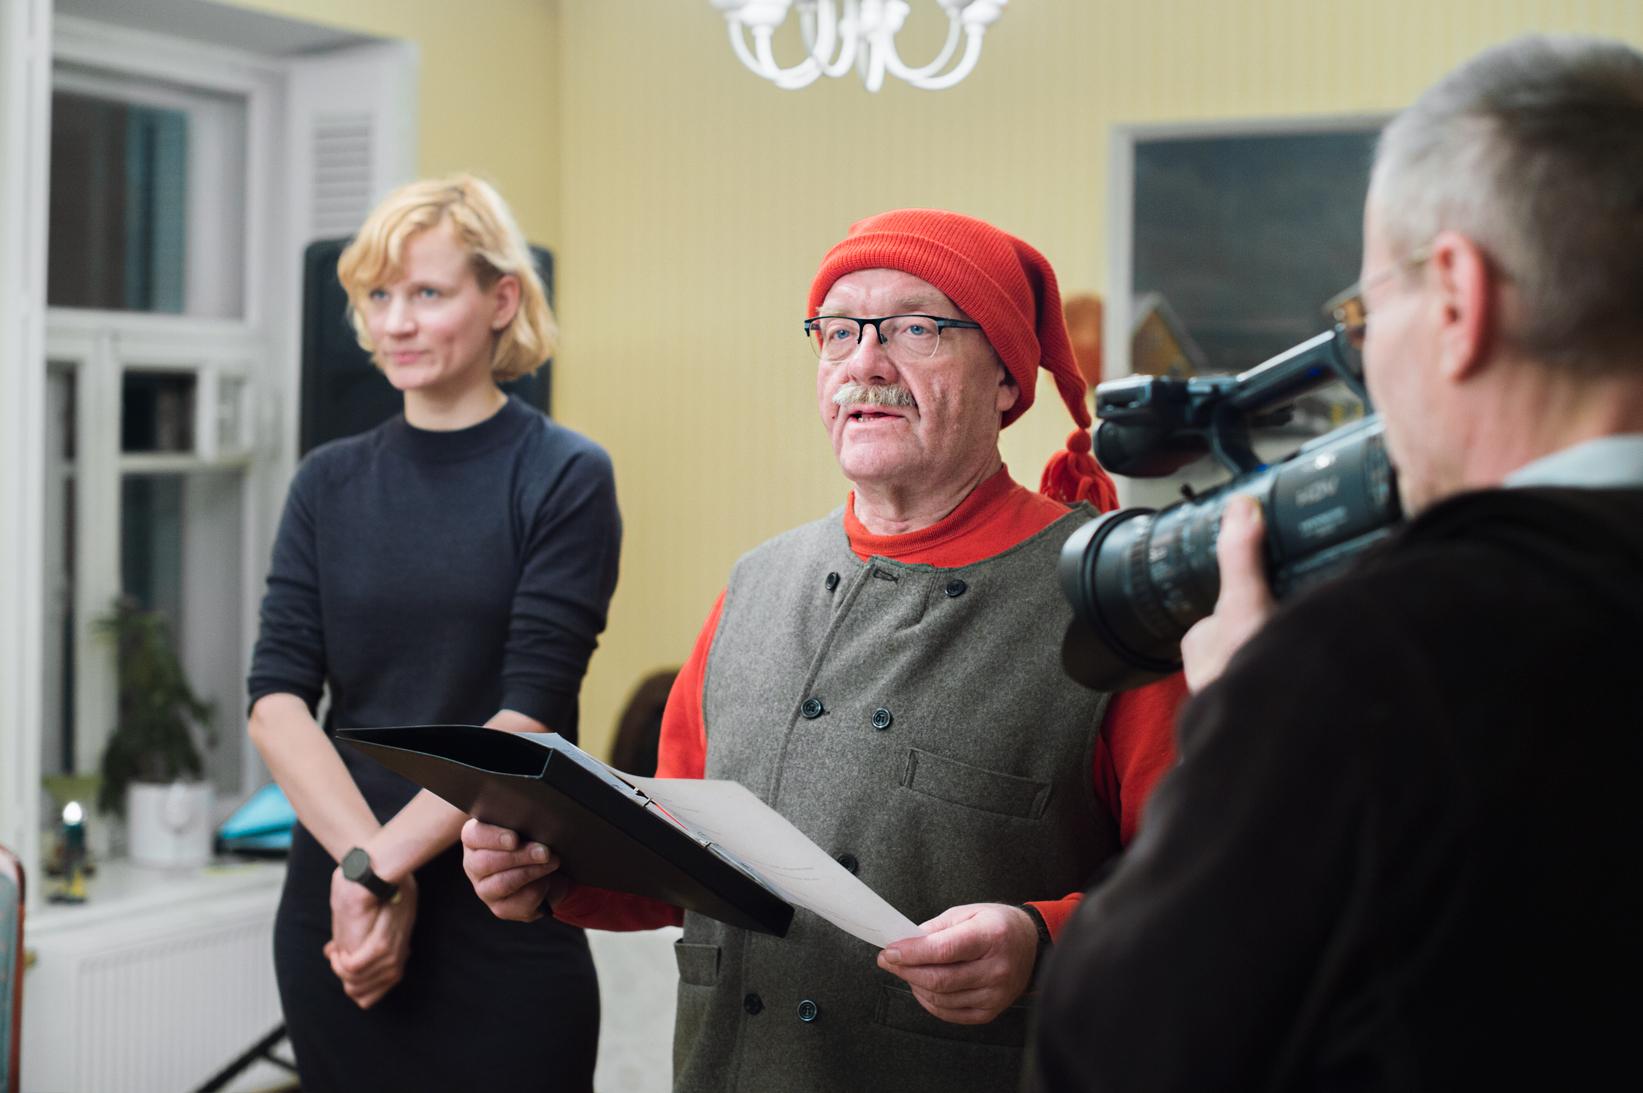 Tiiu-Ann Pello, Peeter Simm, Tõnis Lepik